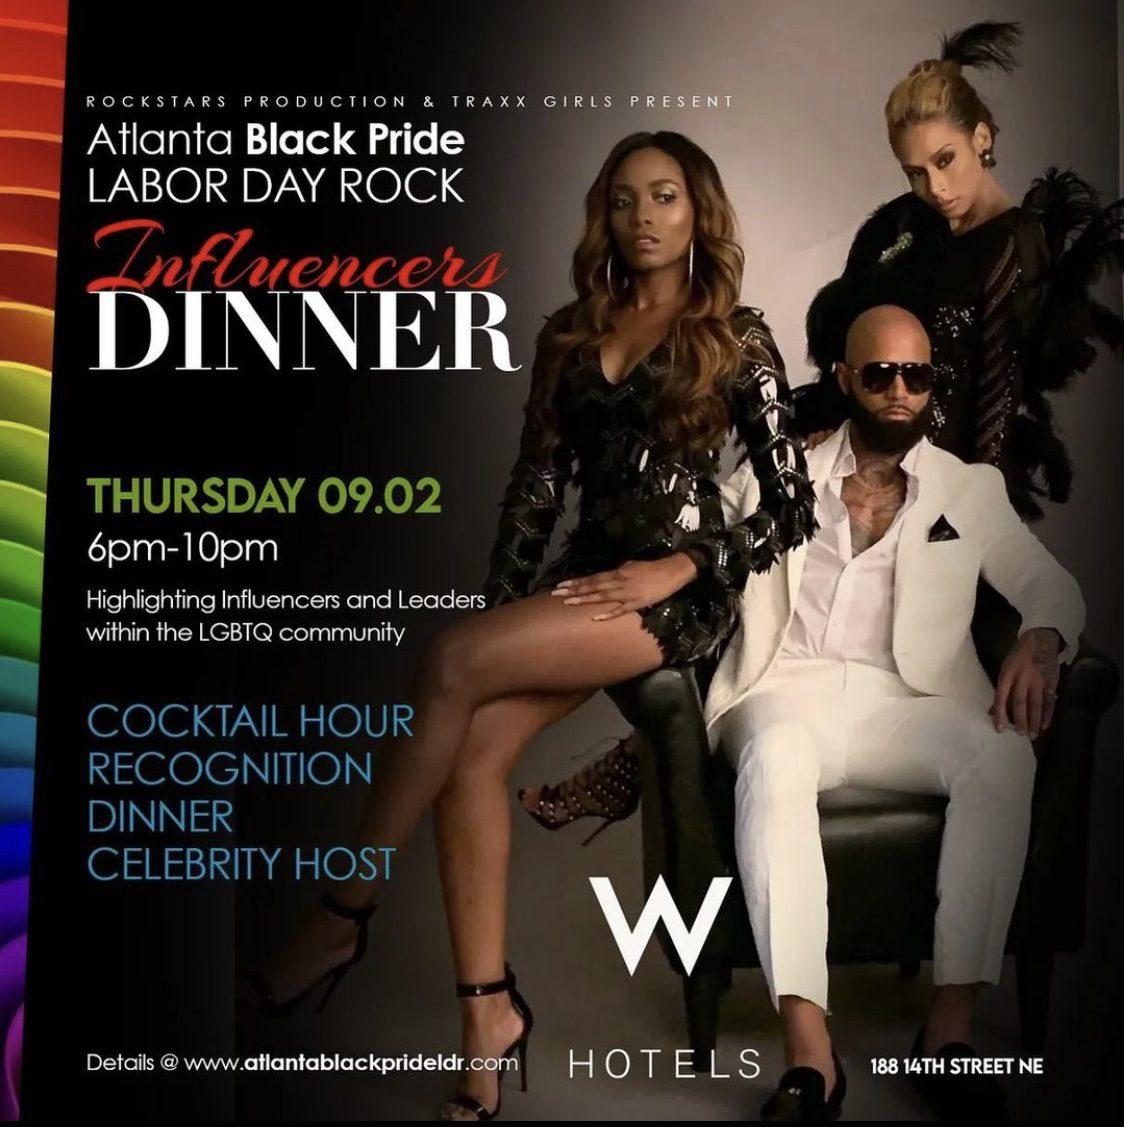 Atlanta Black Pride Labor Day Rock: Influencers Dinner